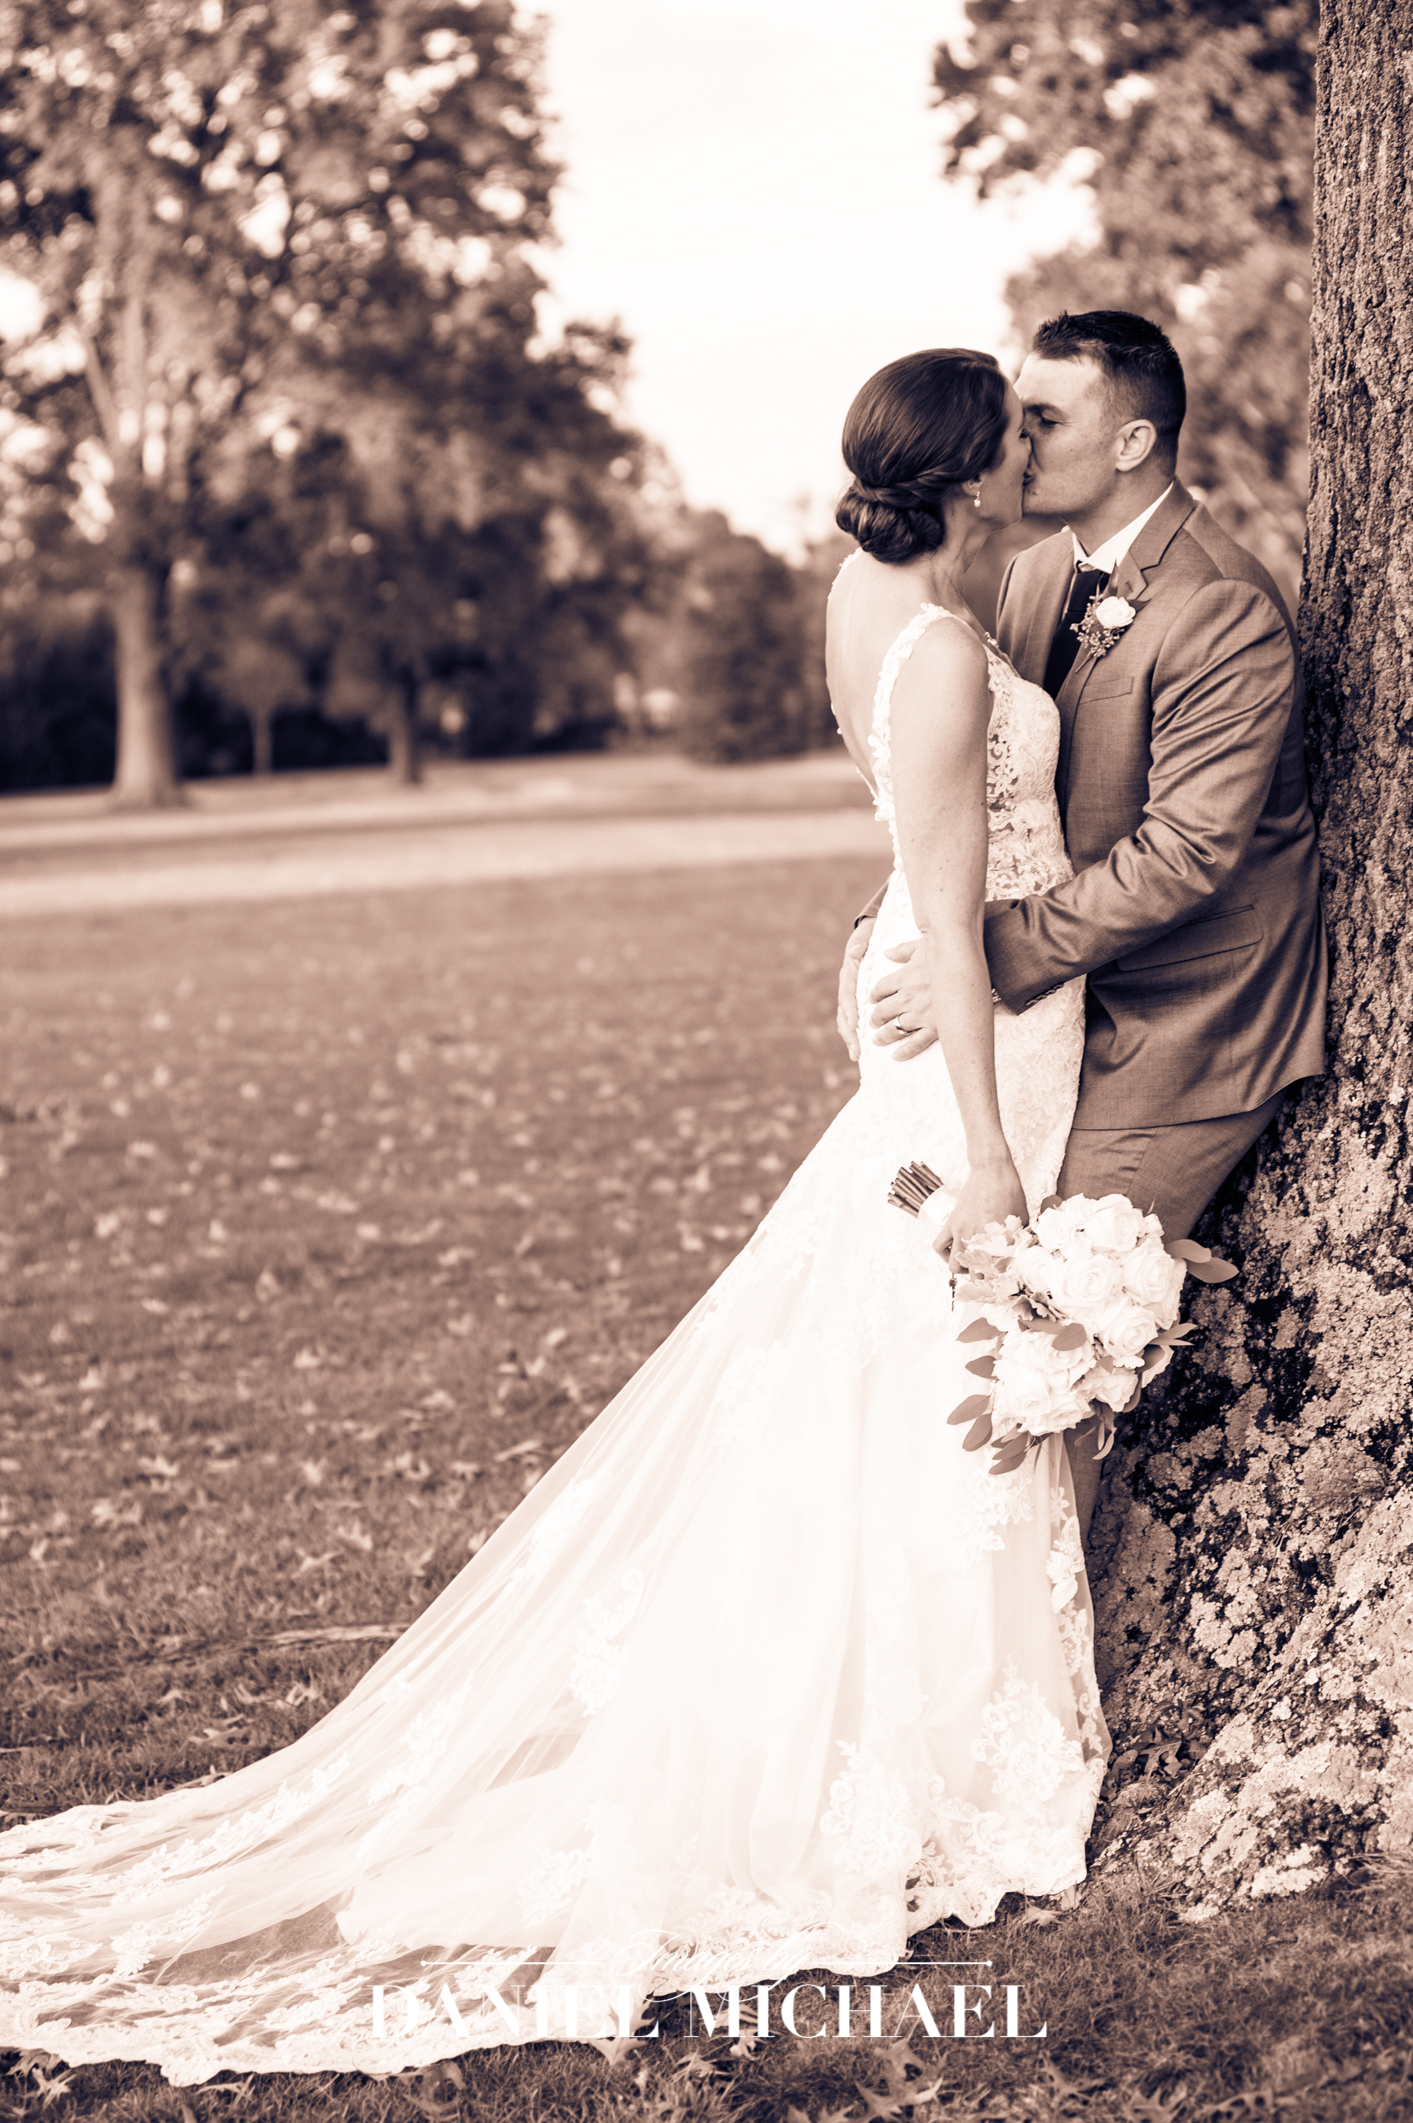 Hyde Park Country Club Reception Ceremony Wedding Venue Photography